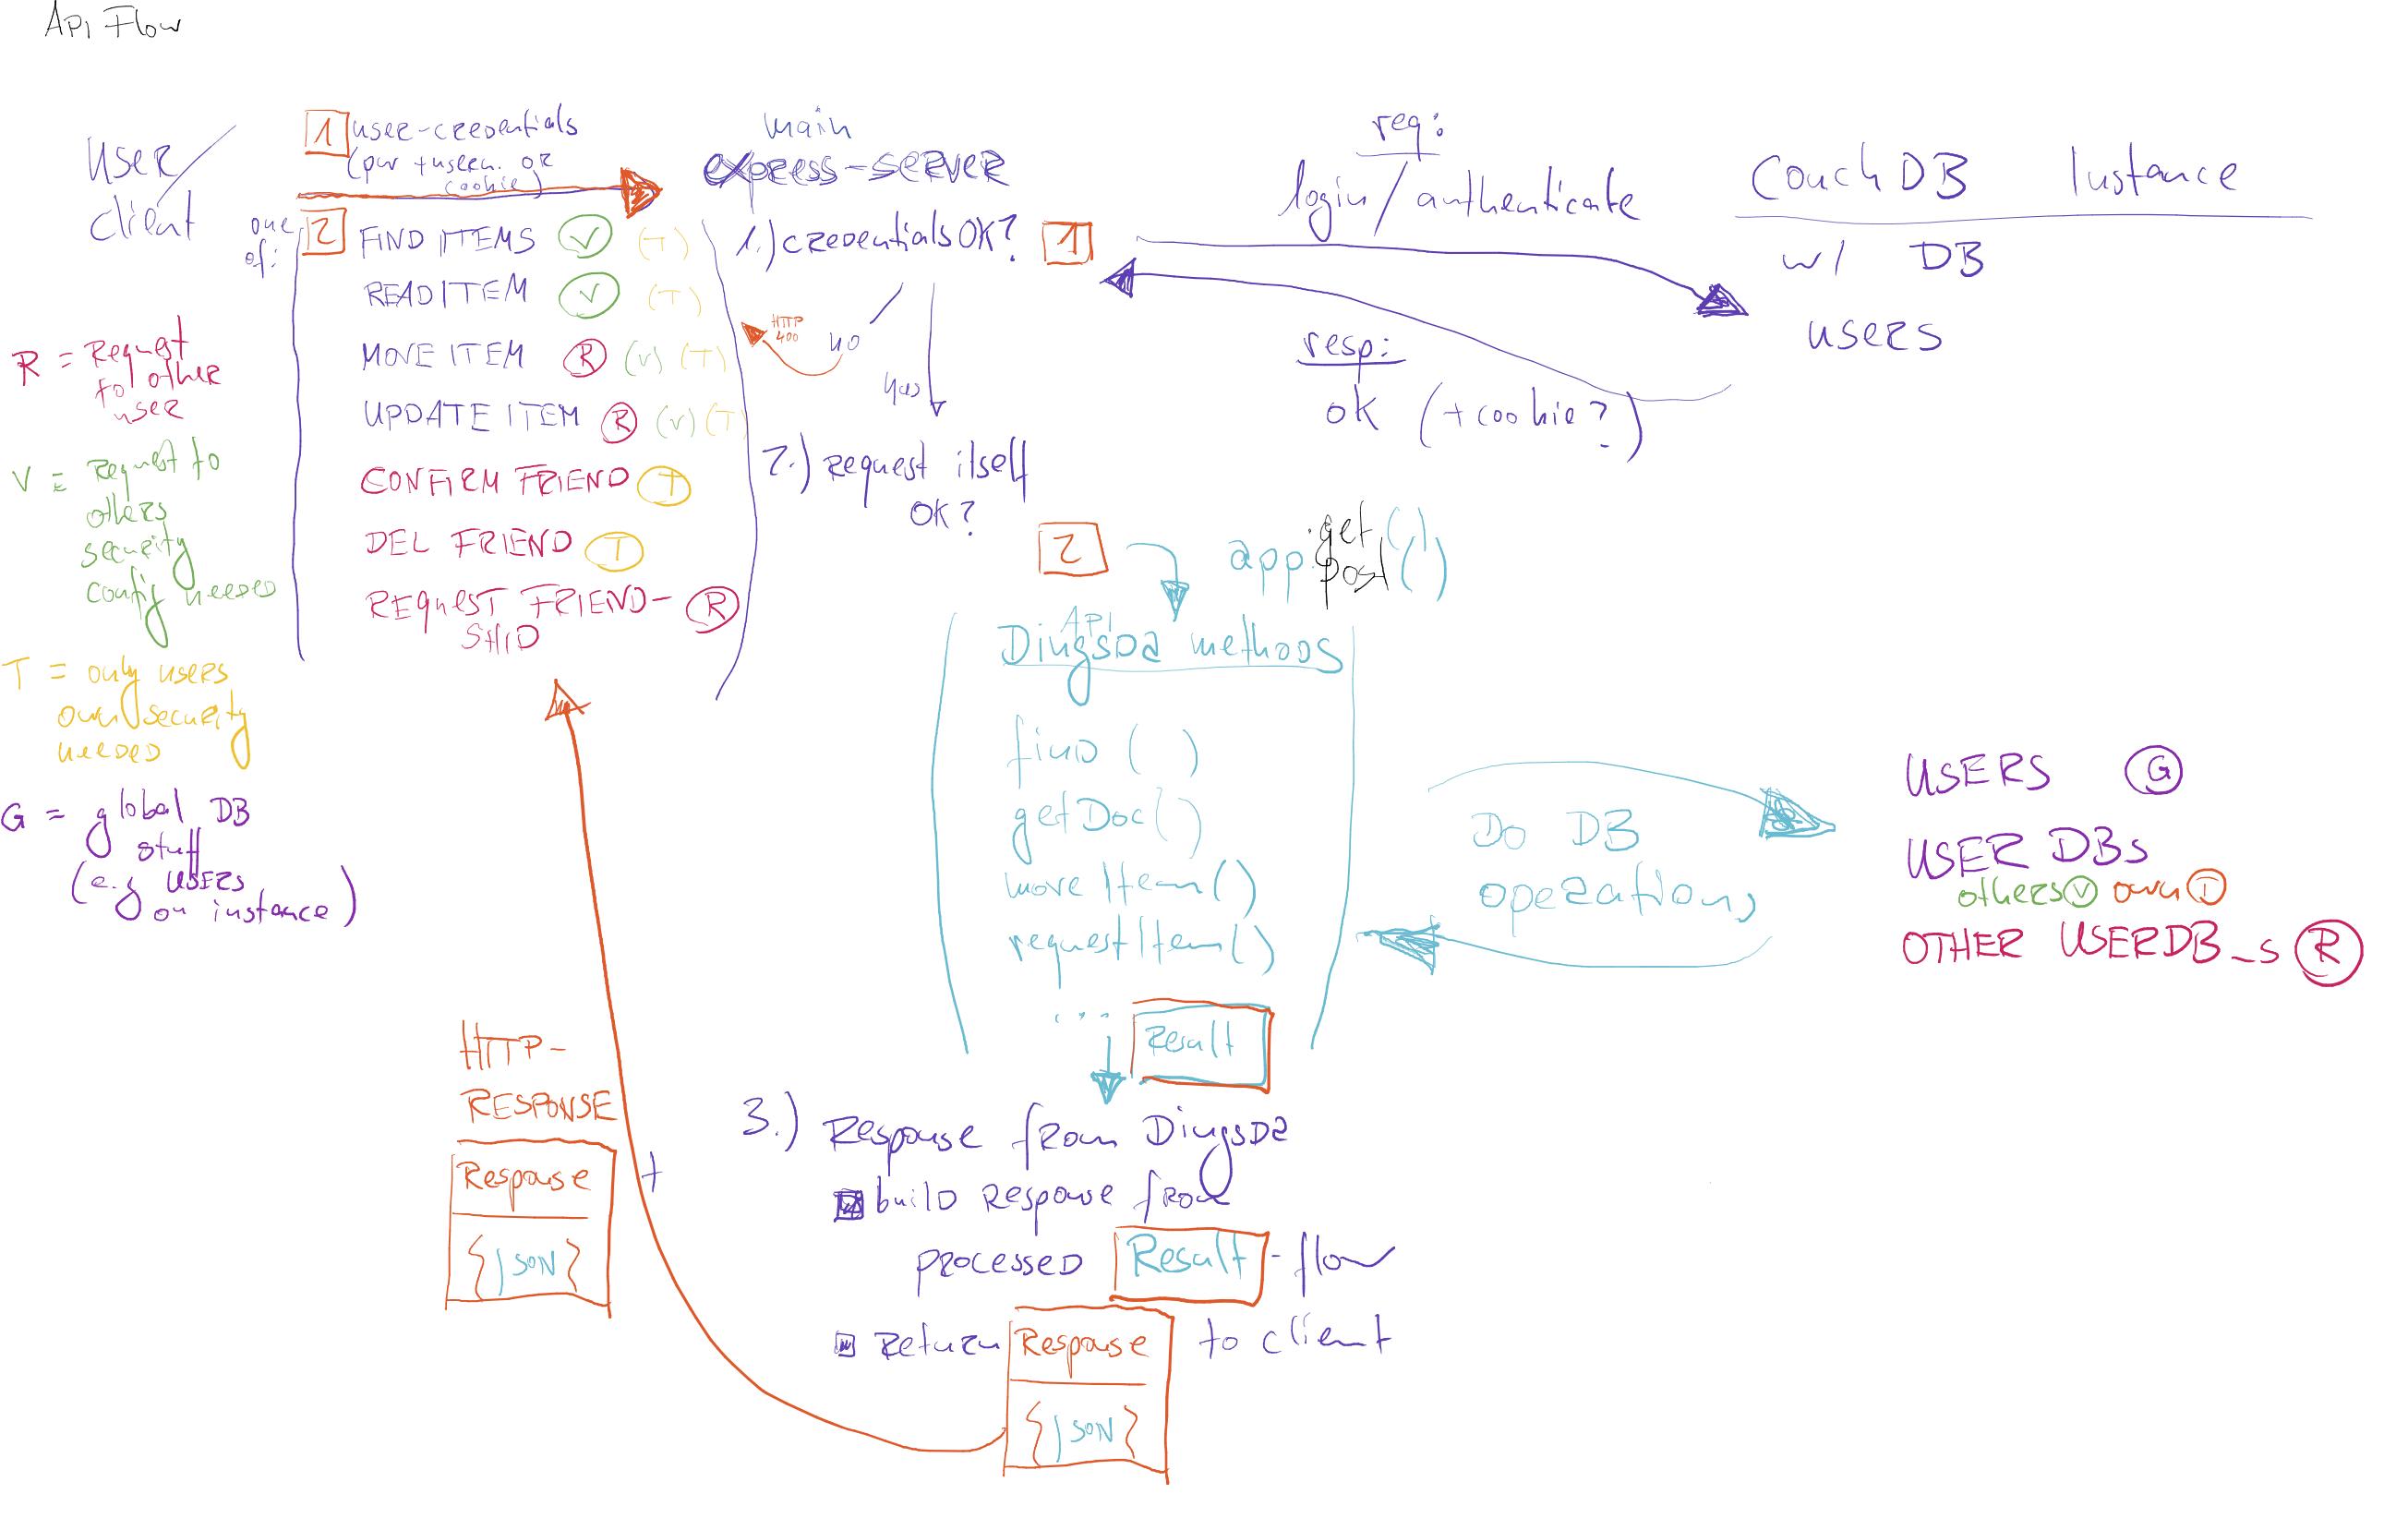 Sketch API flow chart